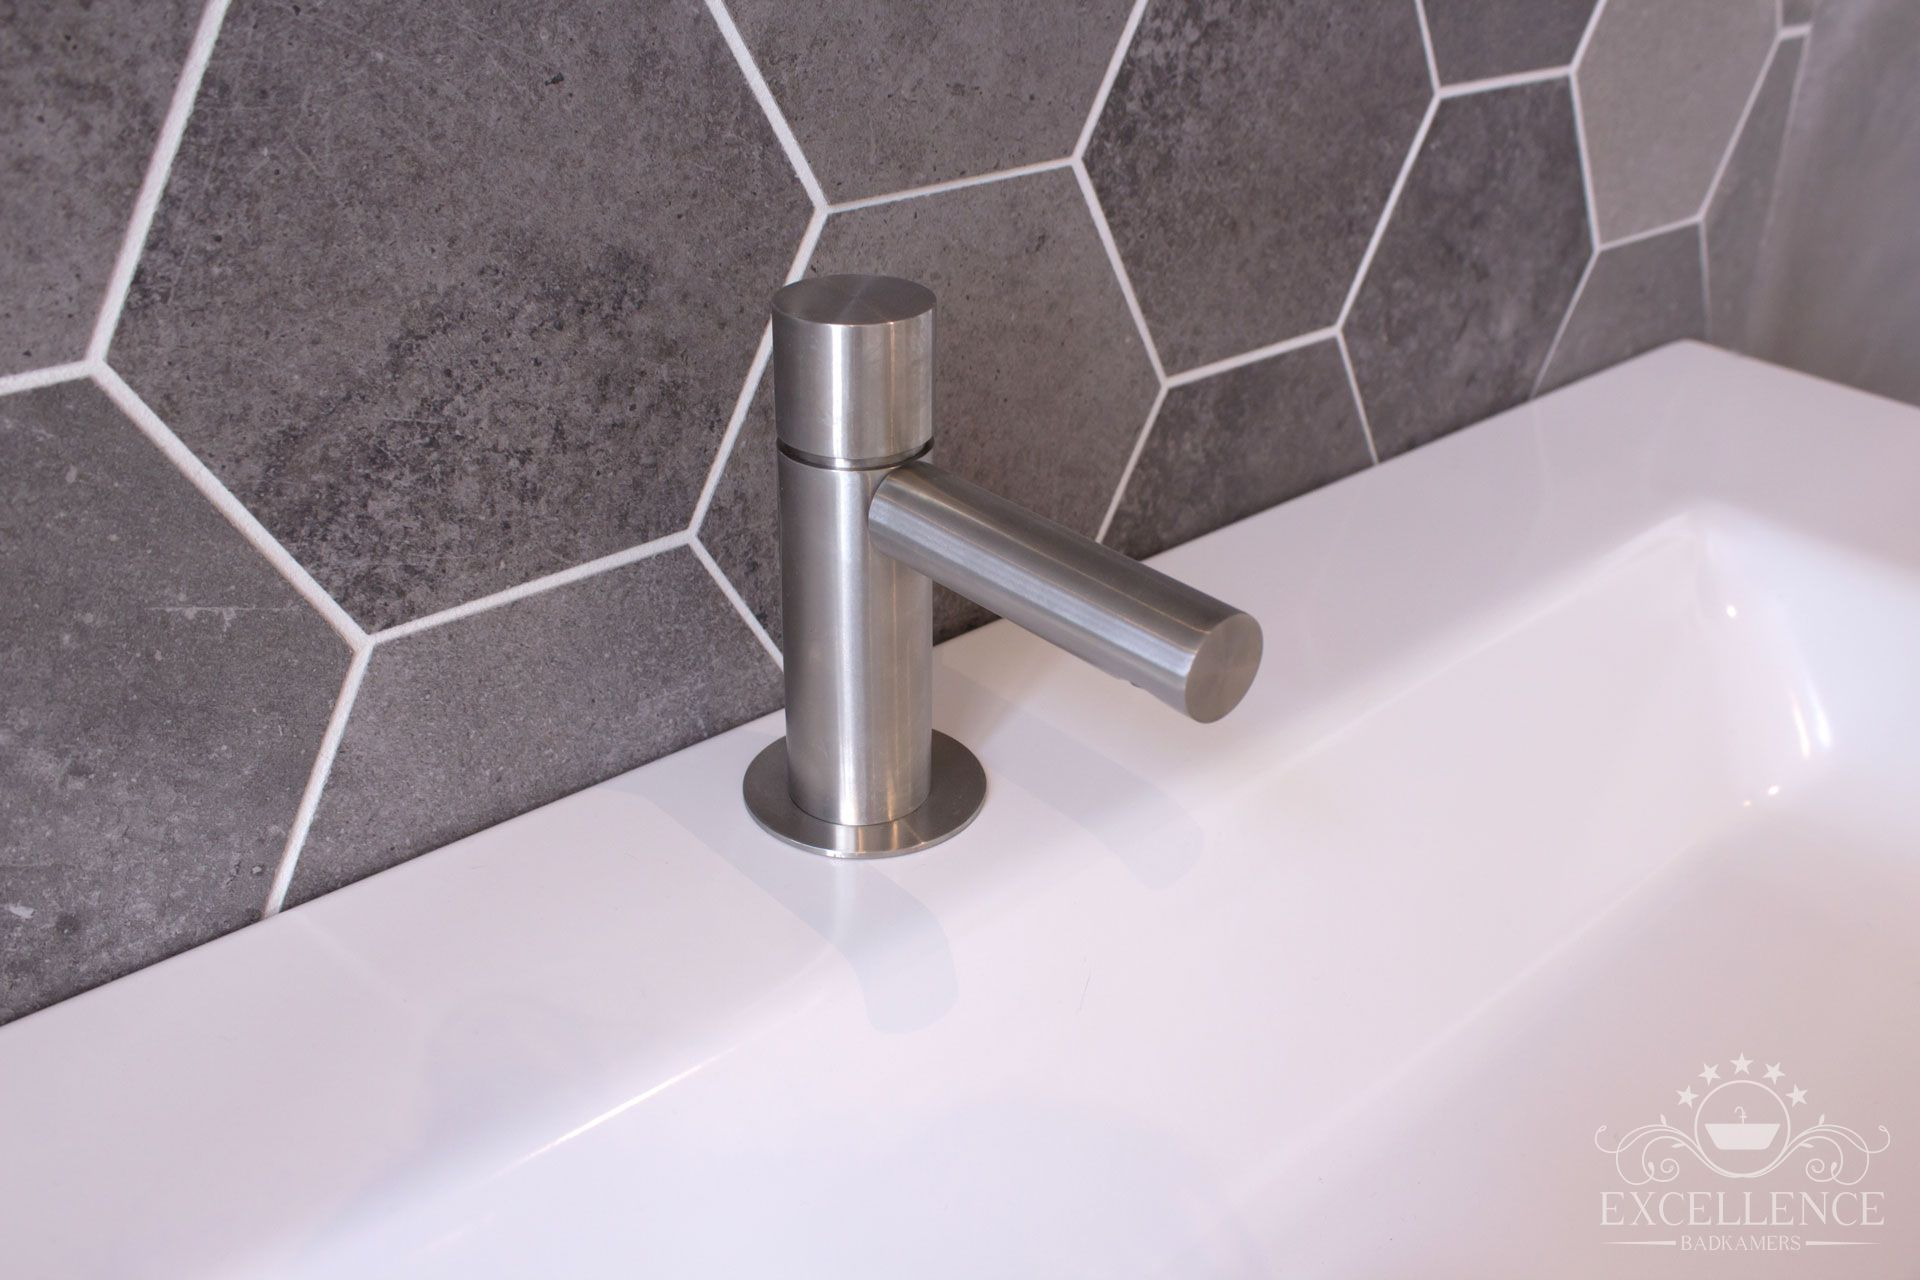 Maatwerk badkamer. rvs opbouw wastafelkraan. wastafel kermamiek